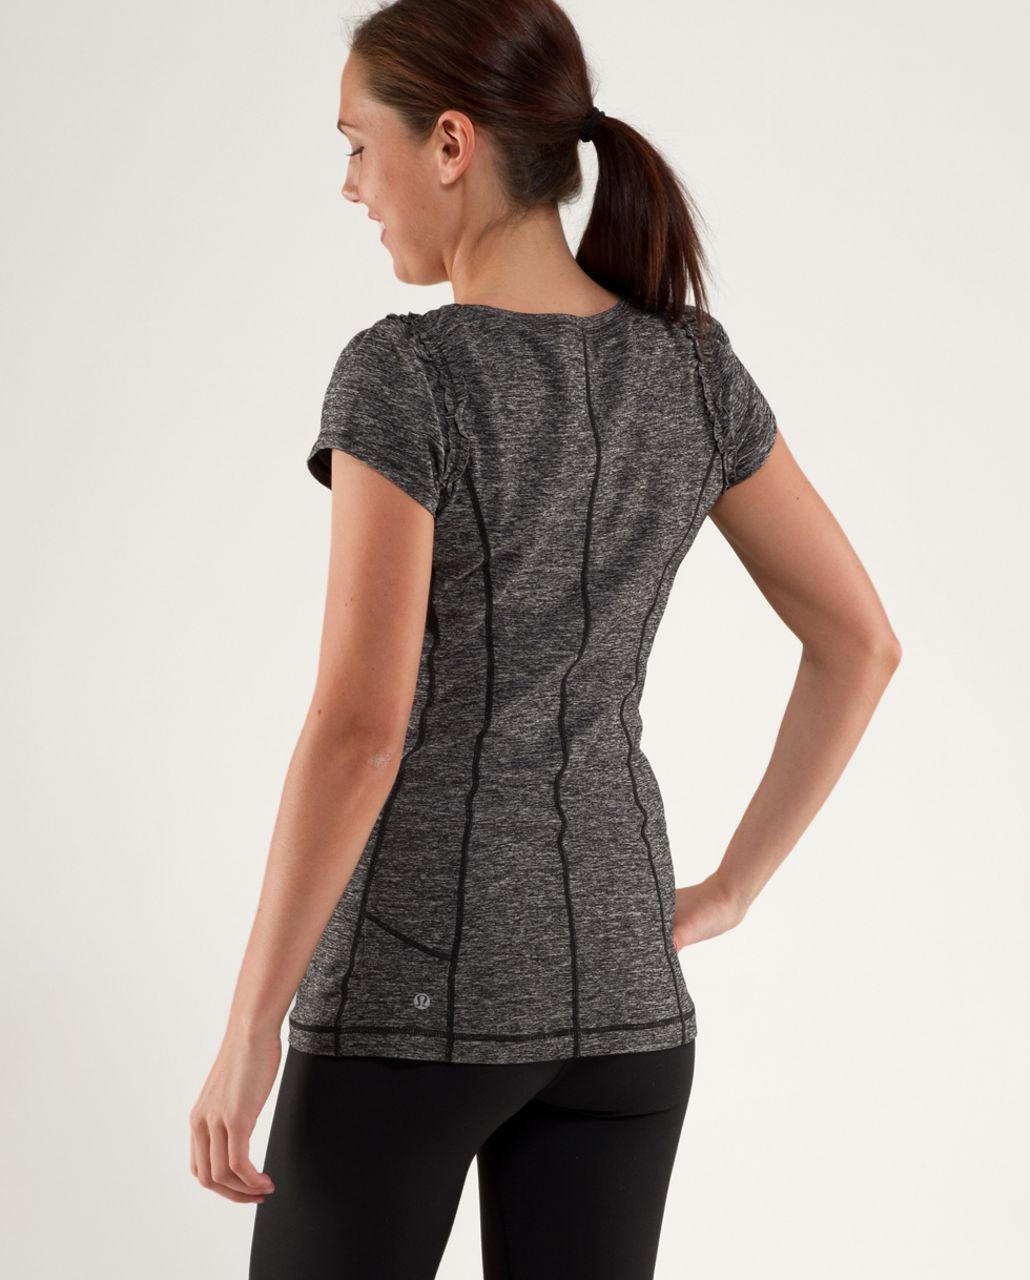 Lululemon Run:  Full Tilt Short Sleeve - Heathered Black